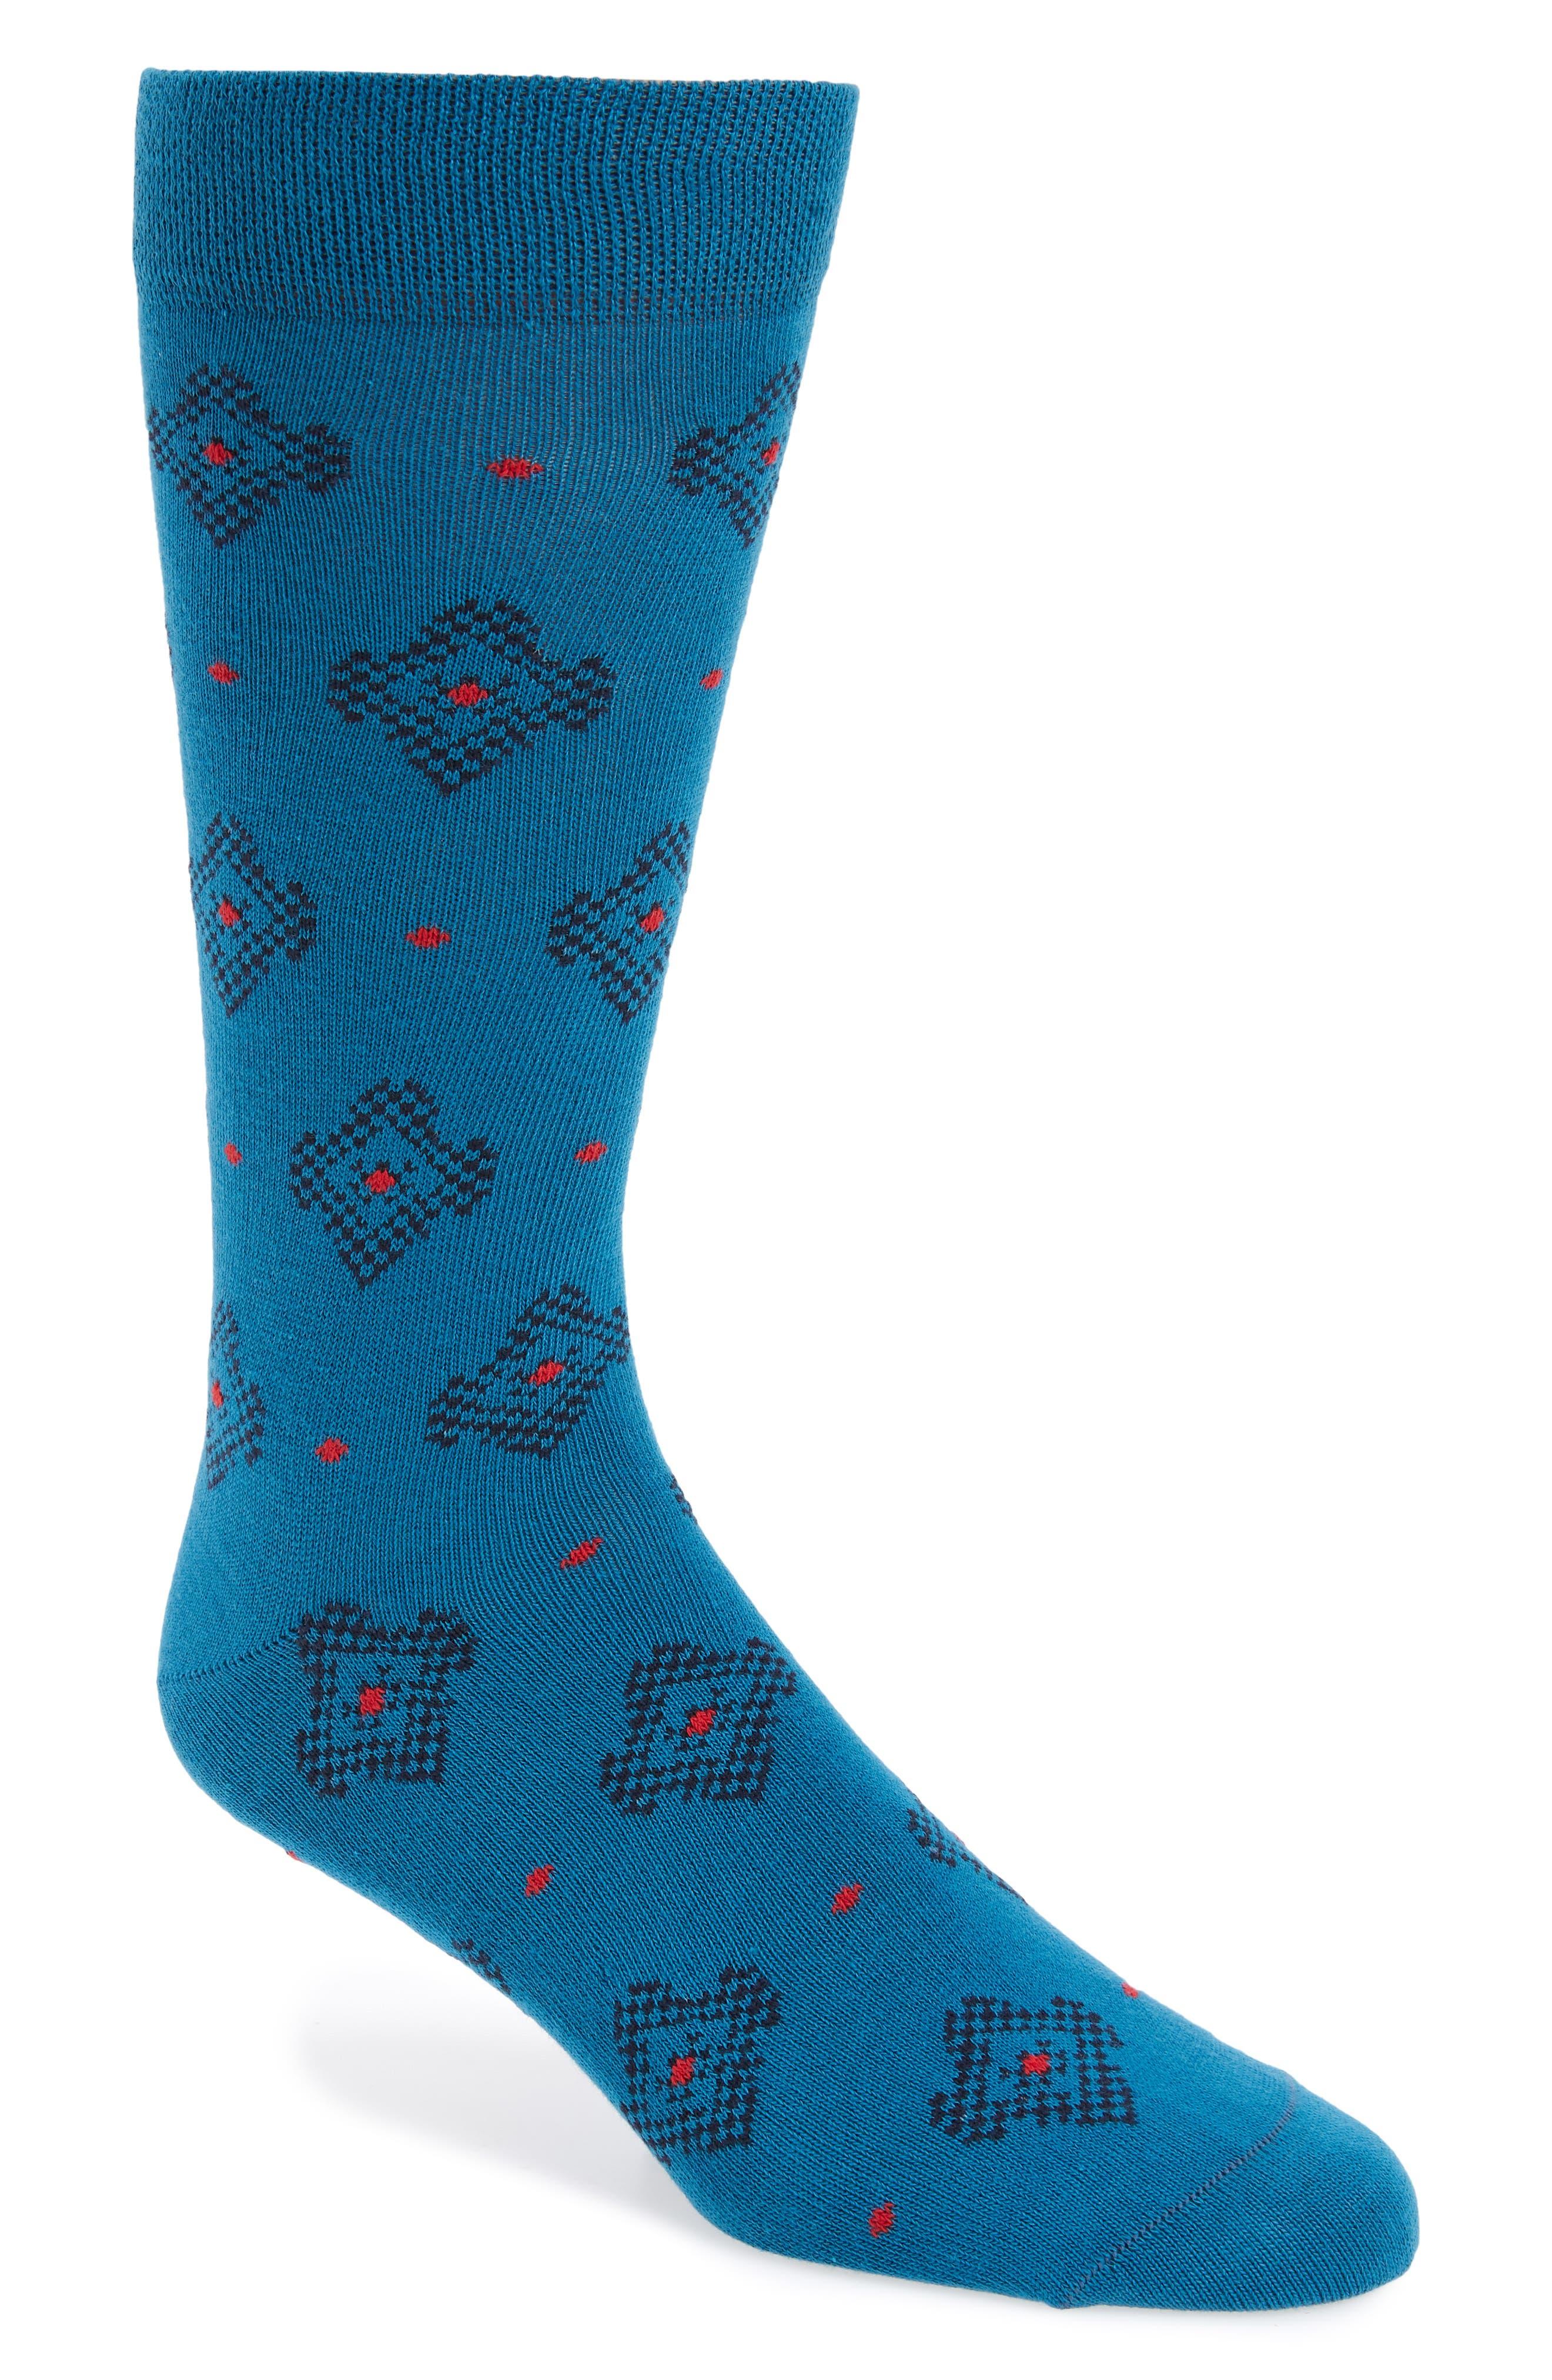 Veryhip Medallion Socks,                         Main,                         color, Blue